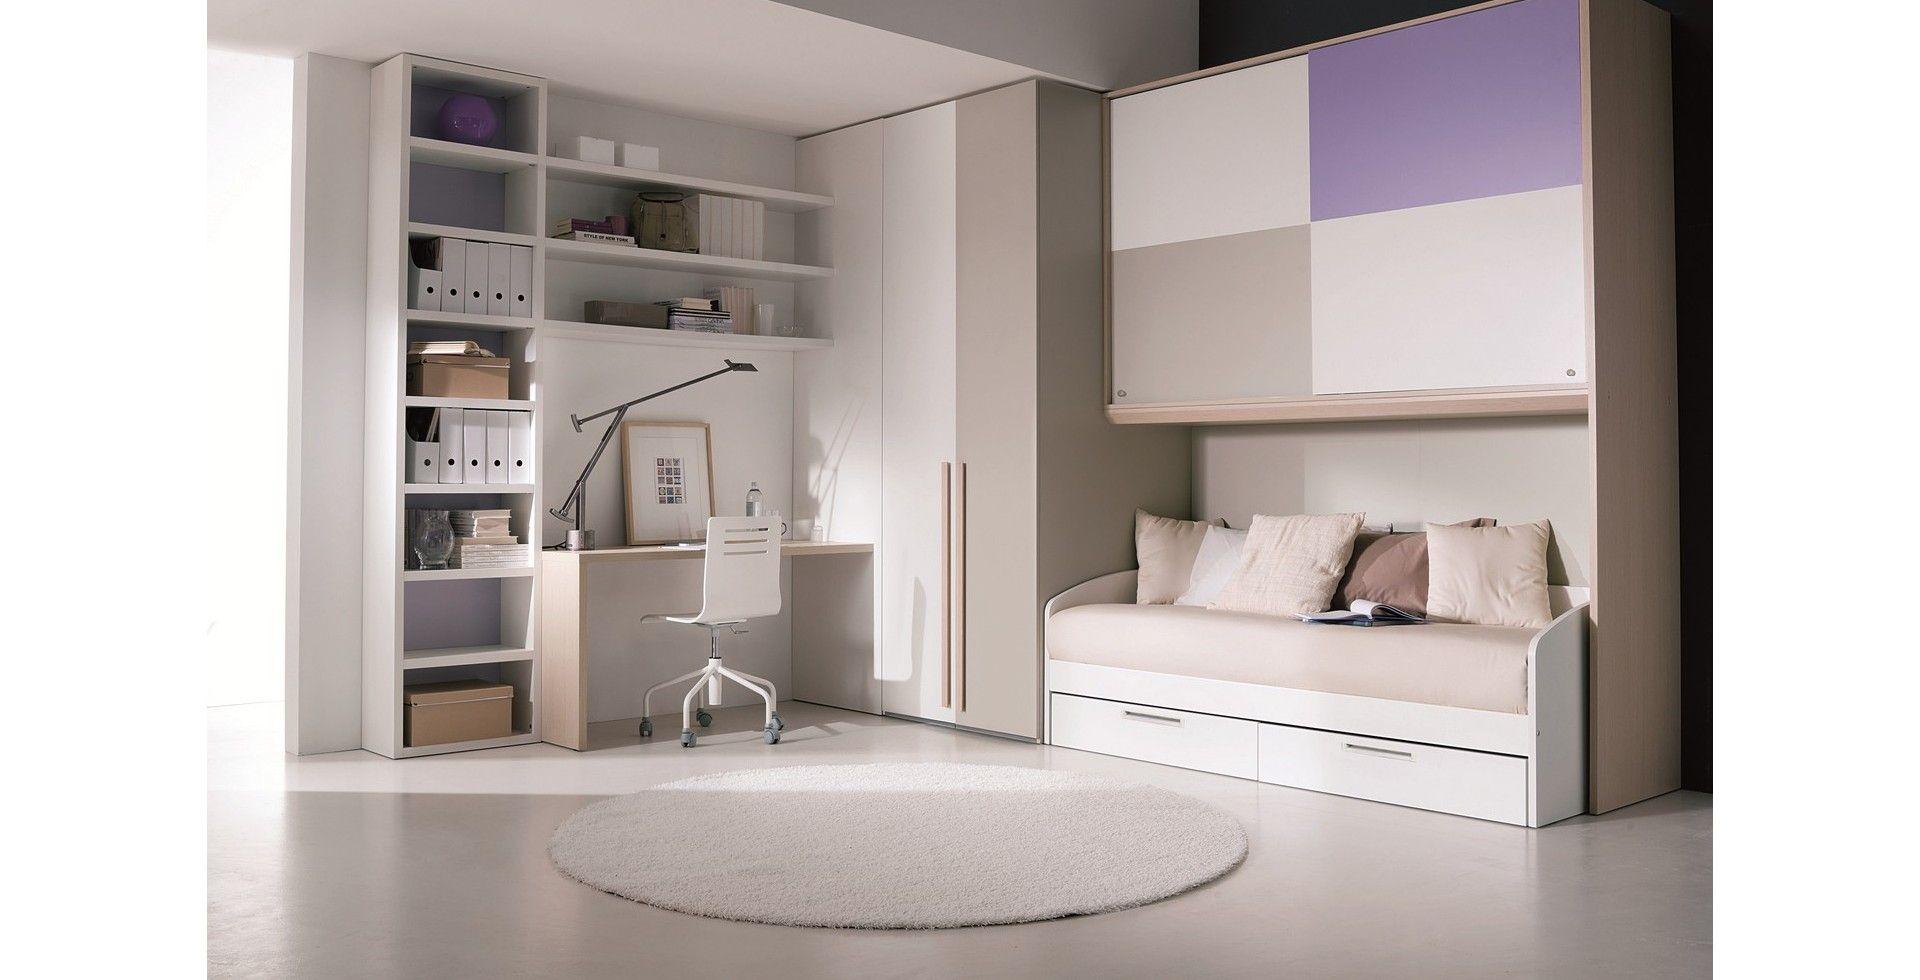 Dielle Camerette ~ X camerette dielle room